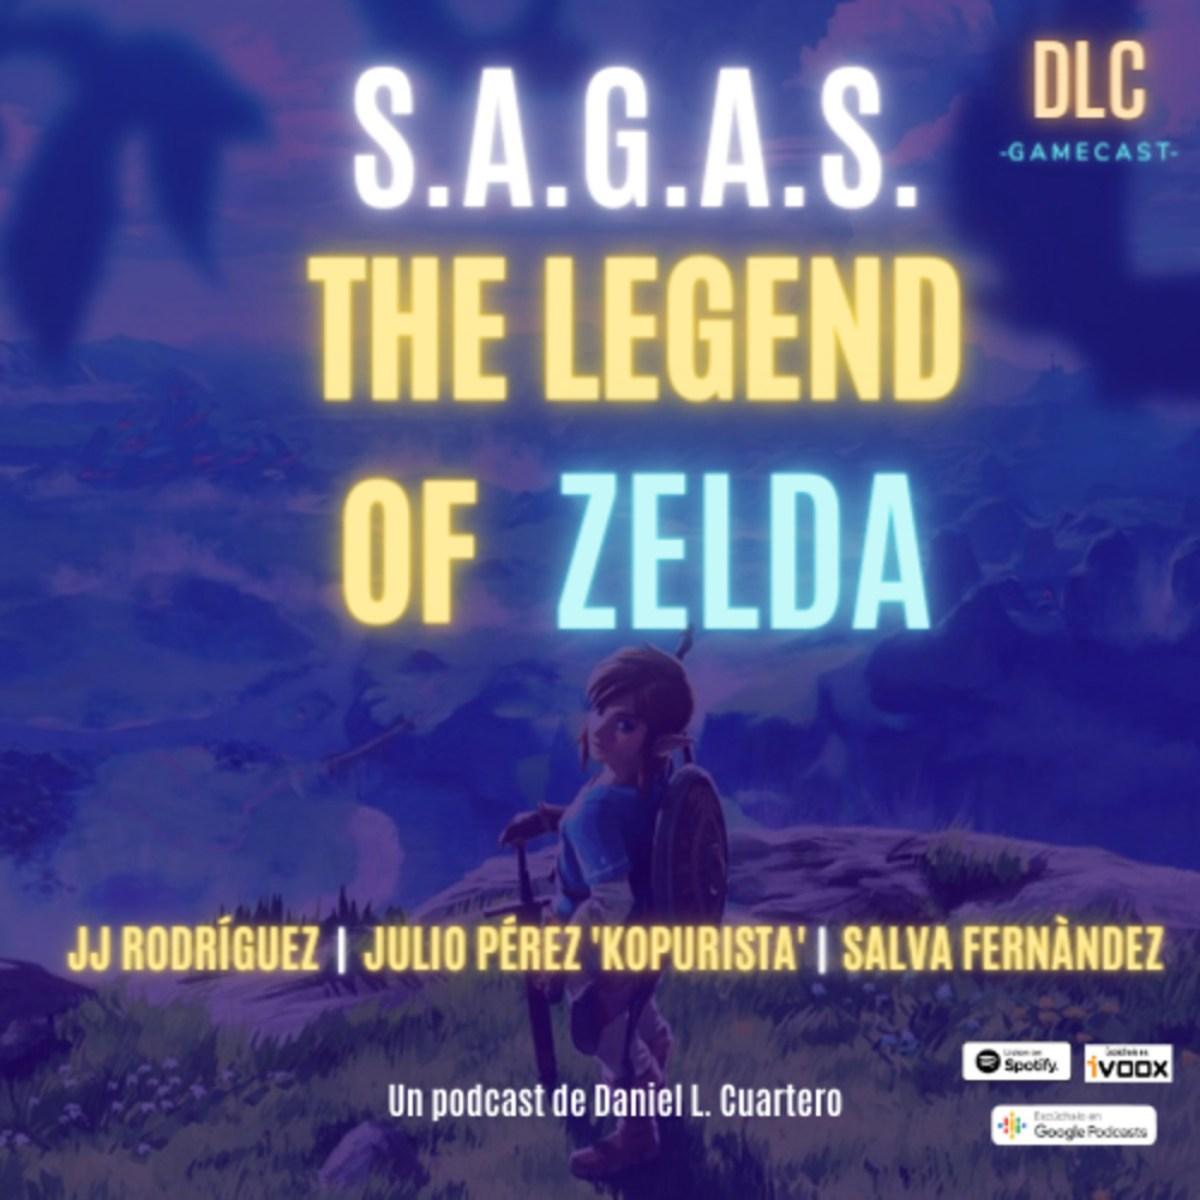 S.A.G.A.S. The Legend of Zelda